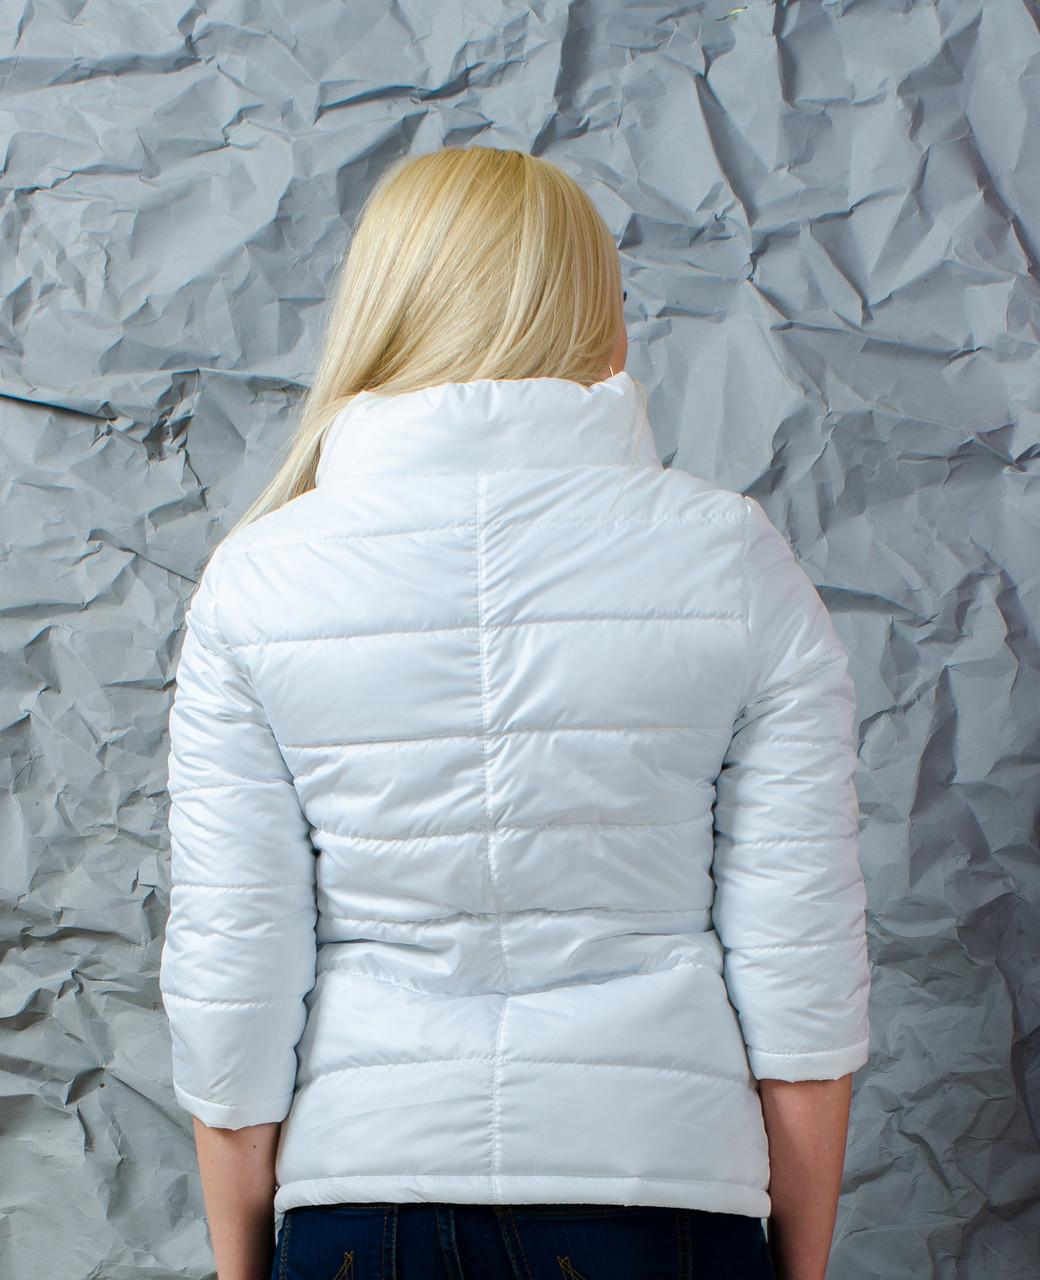 4b23e06fa10 Куртка женская рукав 3 4 белая  продажа